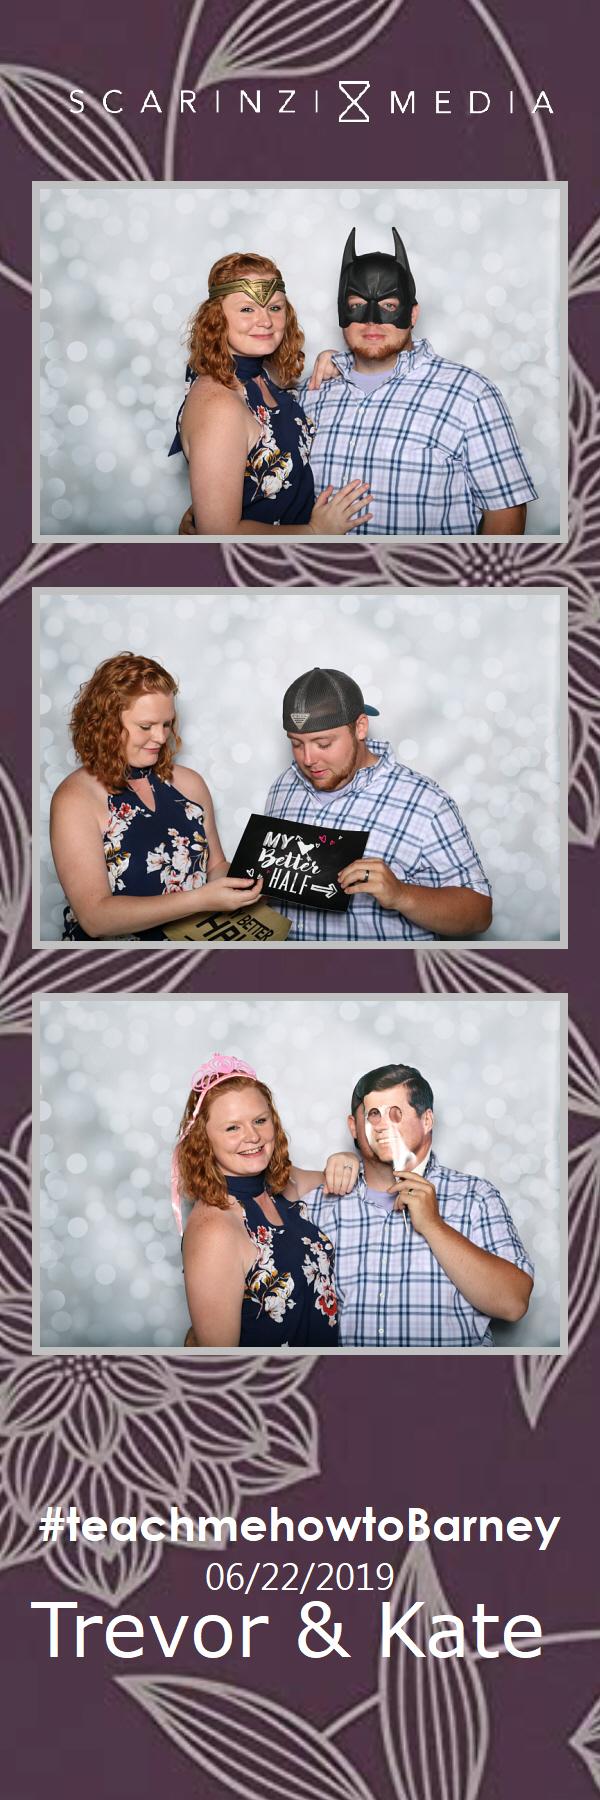 2019.06.22 - Barney Wedding PHOTOBOOTH07.jpg